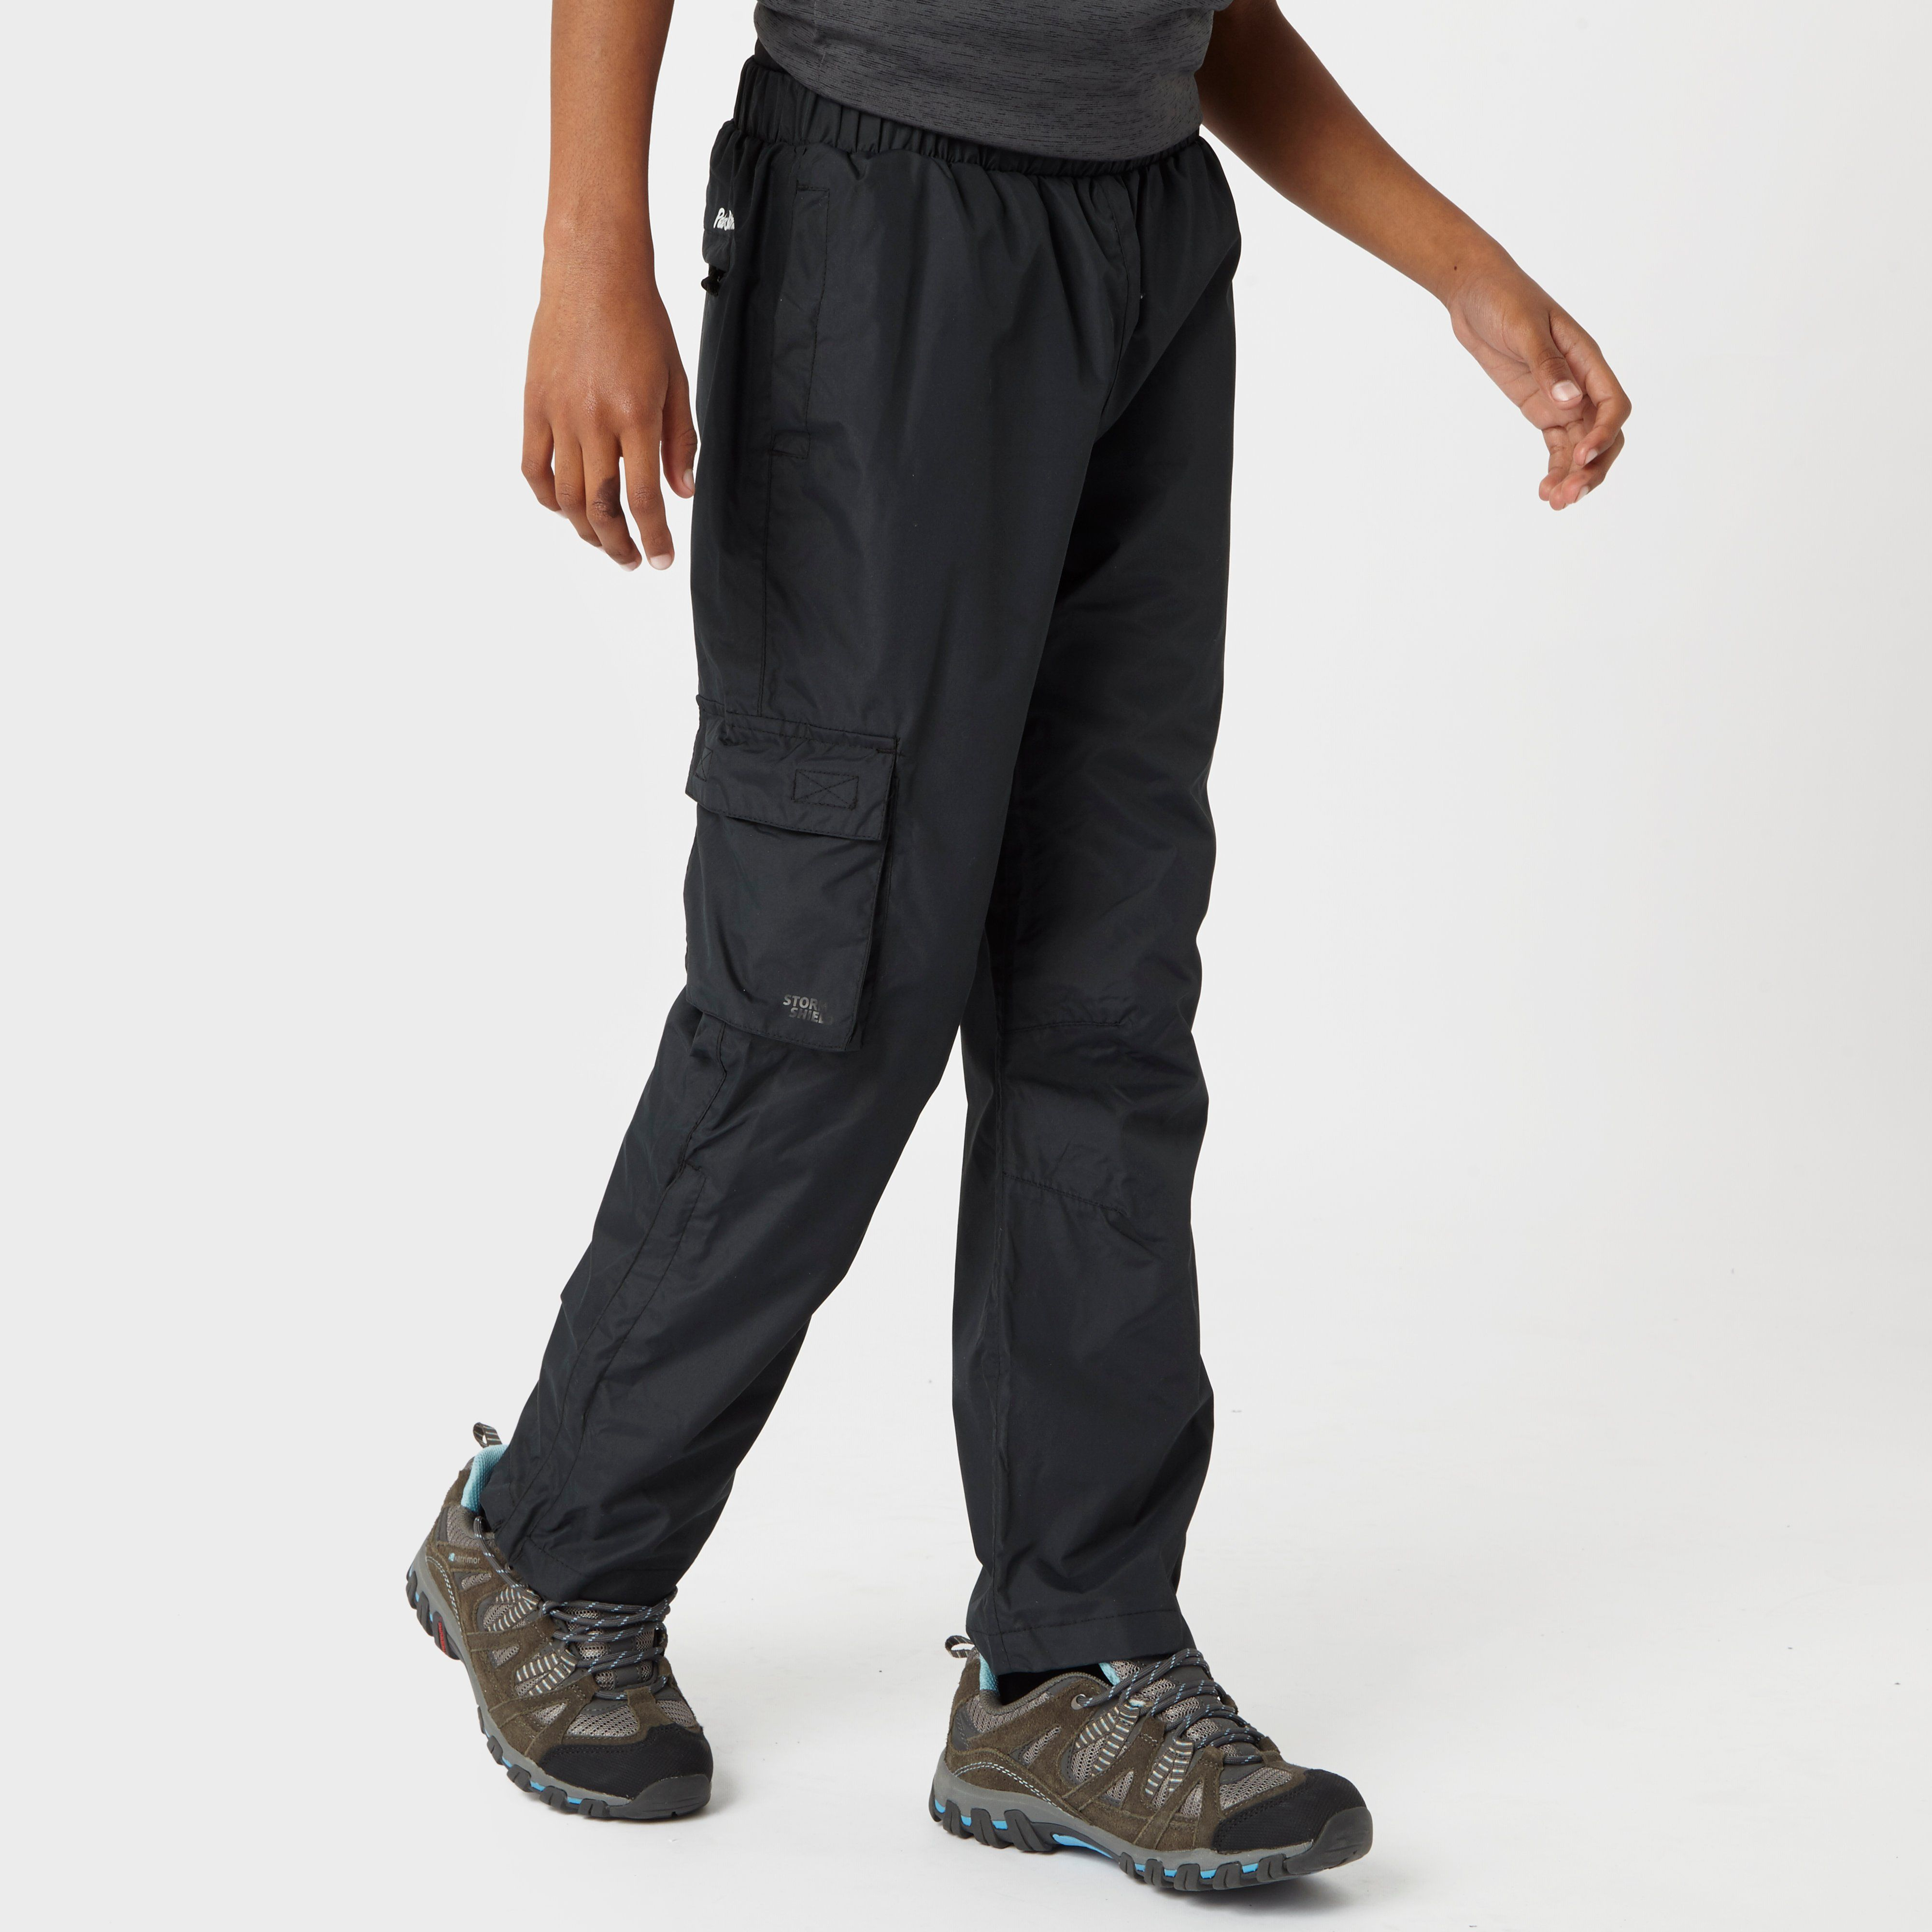 PETER STORM Kids' Storm Waterproof Trousers